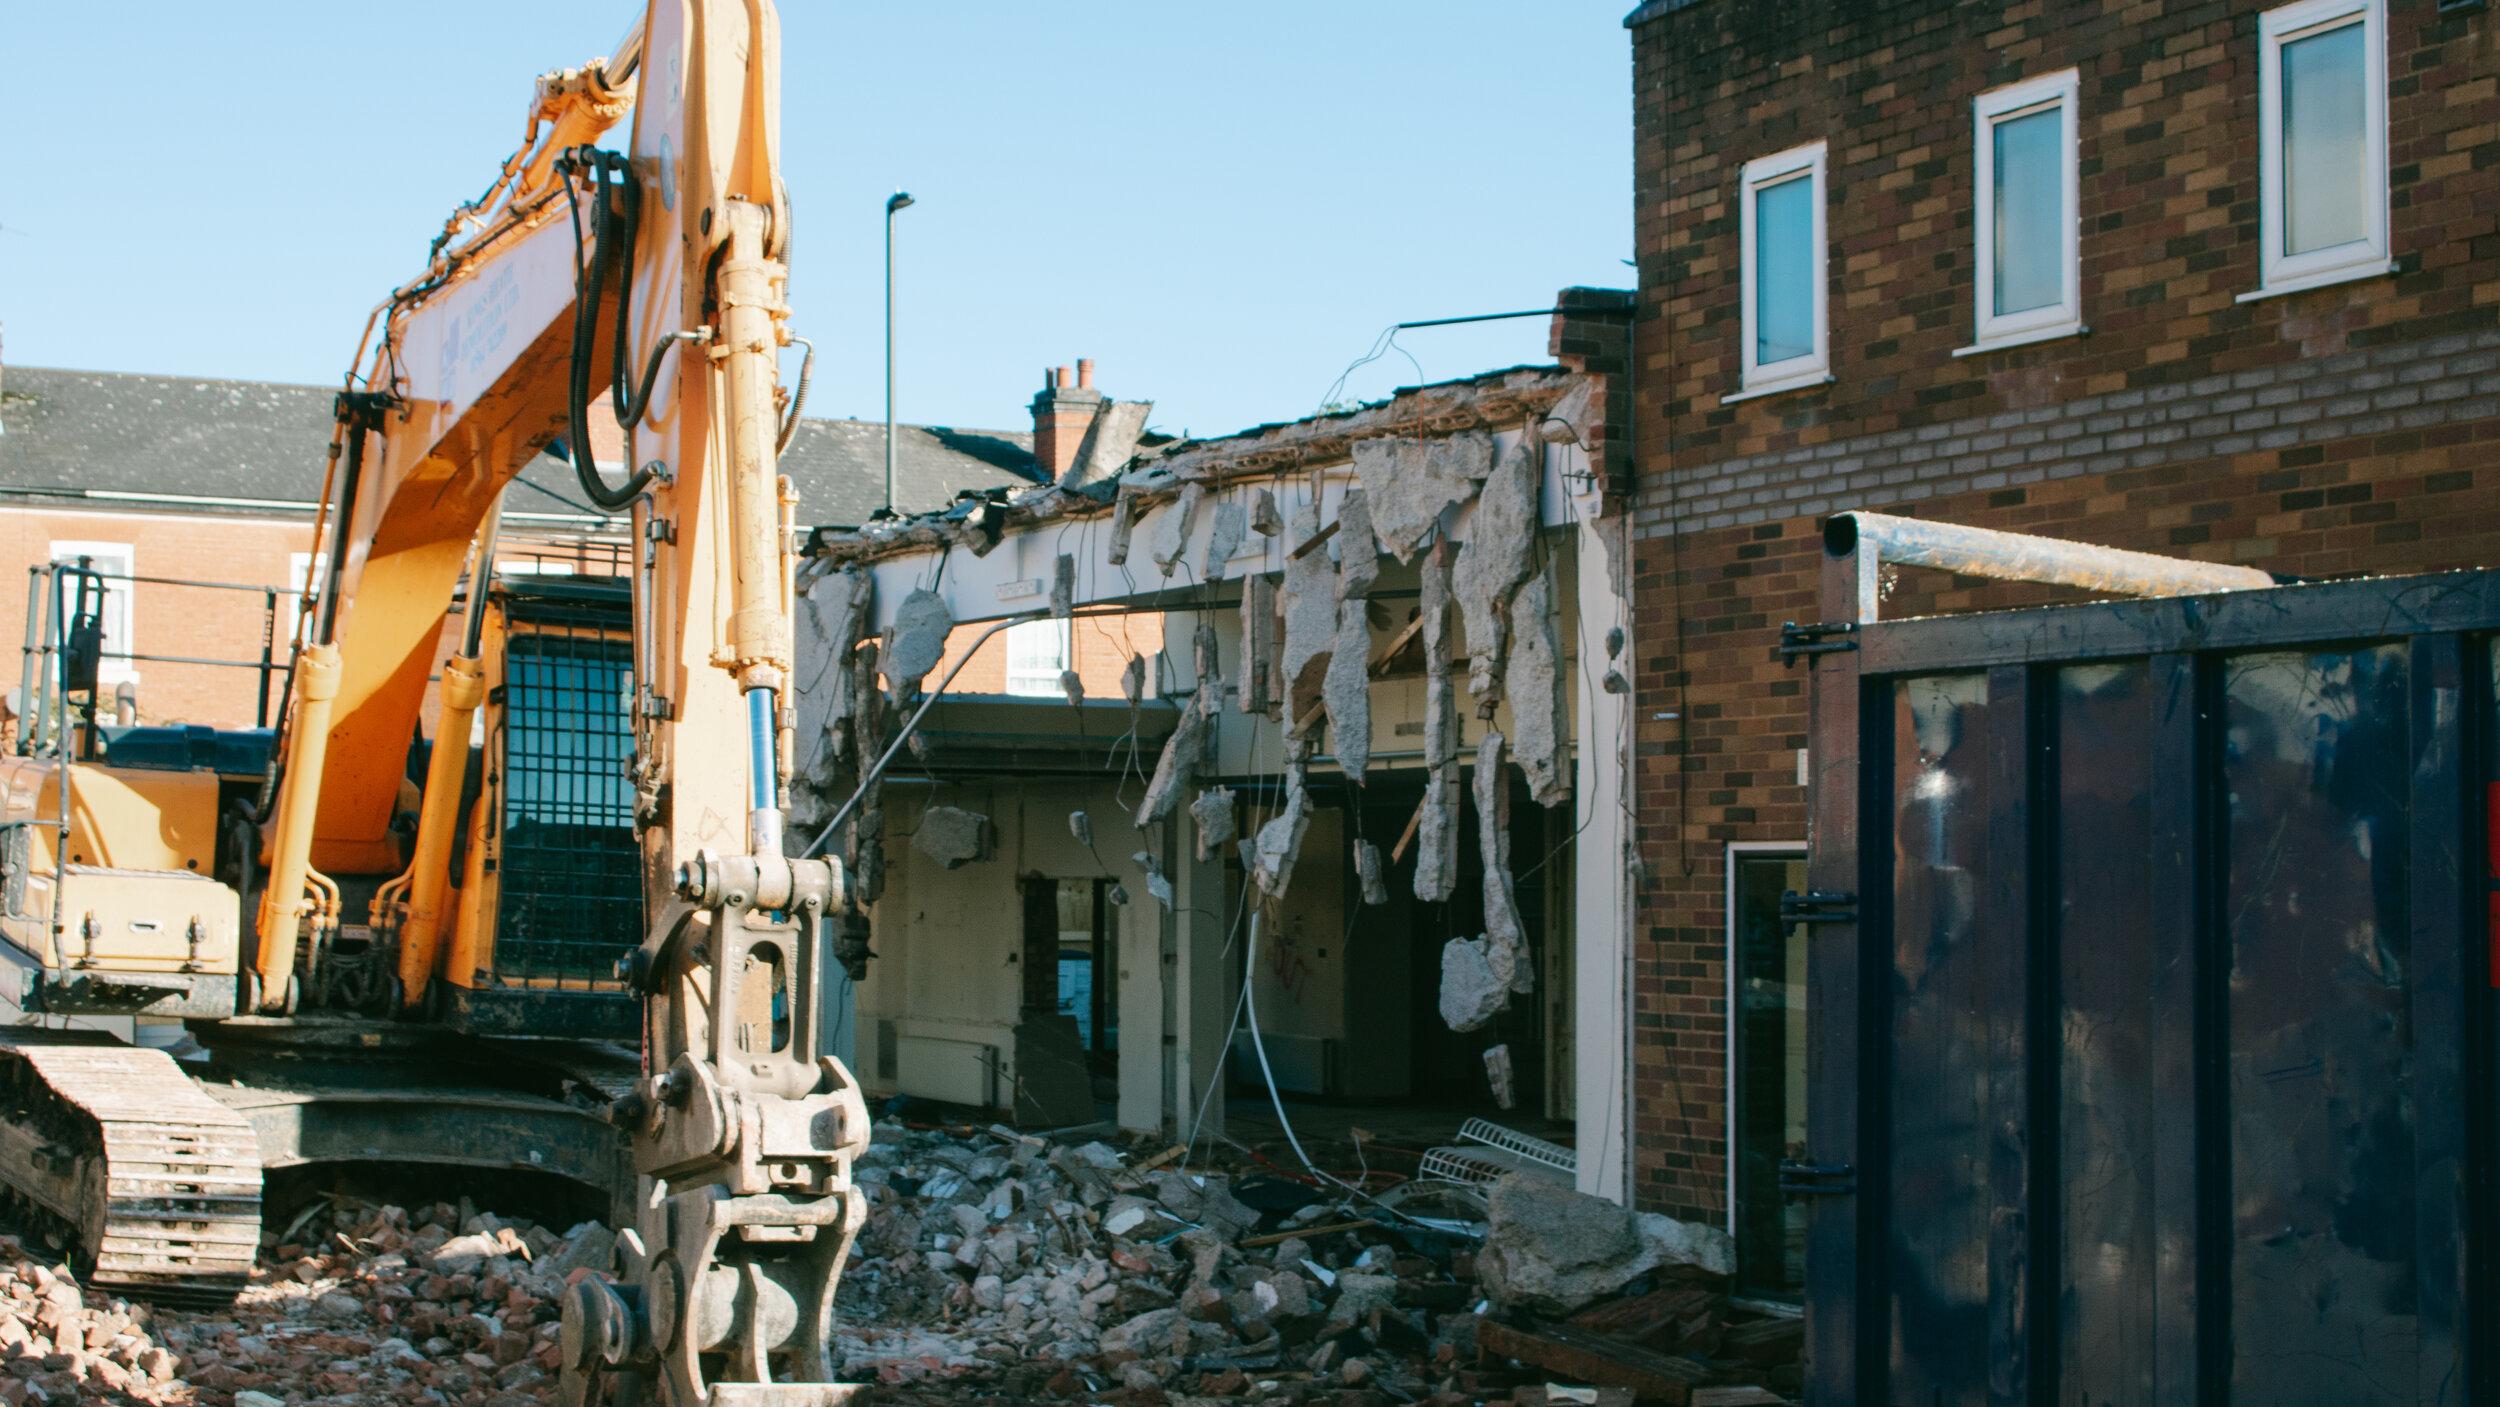 st-johns-harborne-bfm-demolition-oct-19-je-2893.jpg